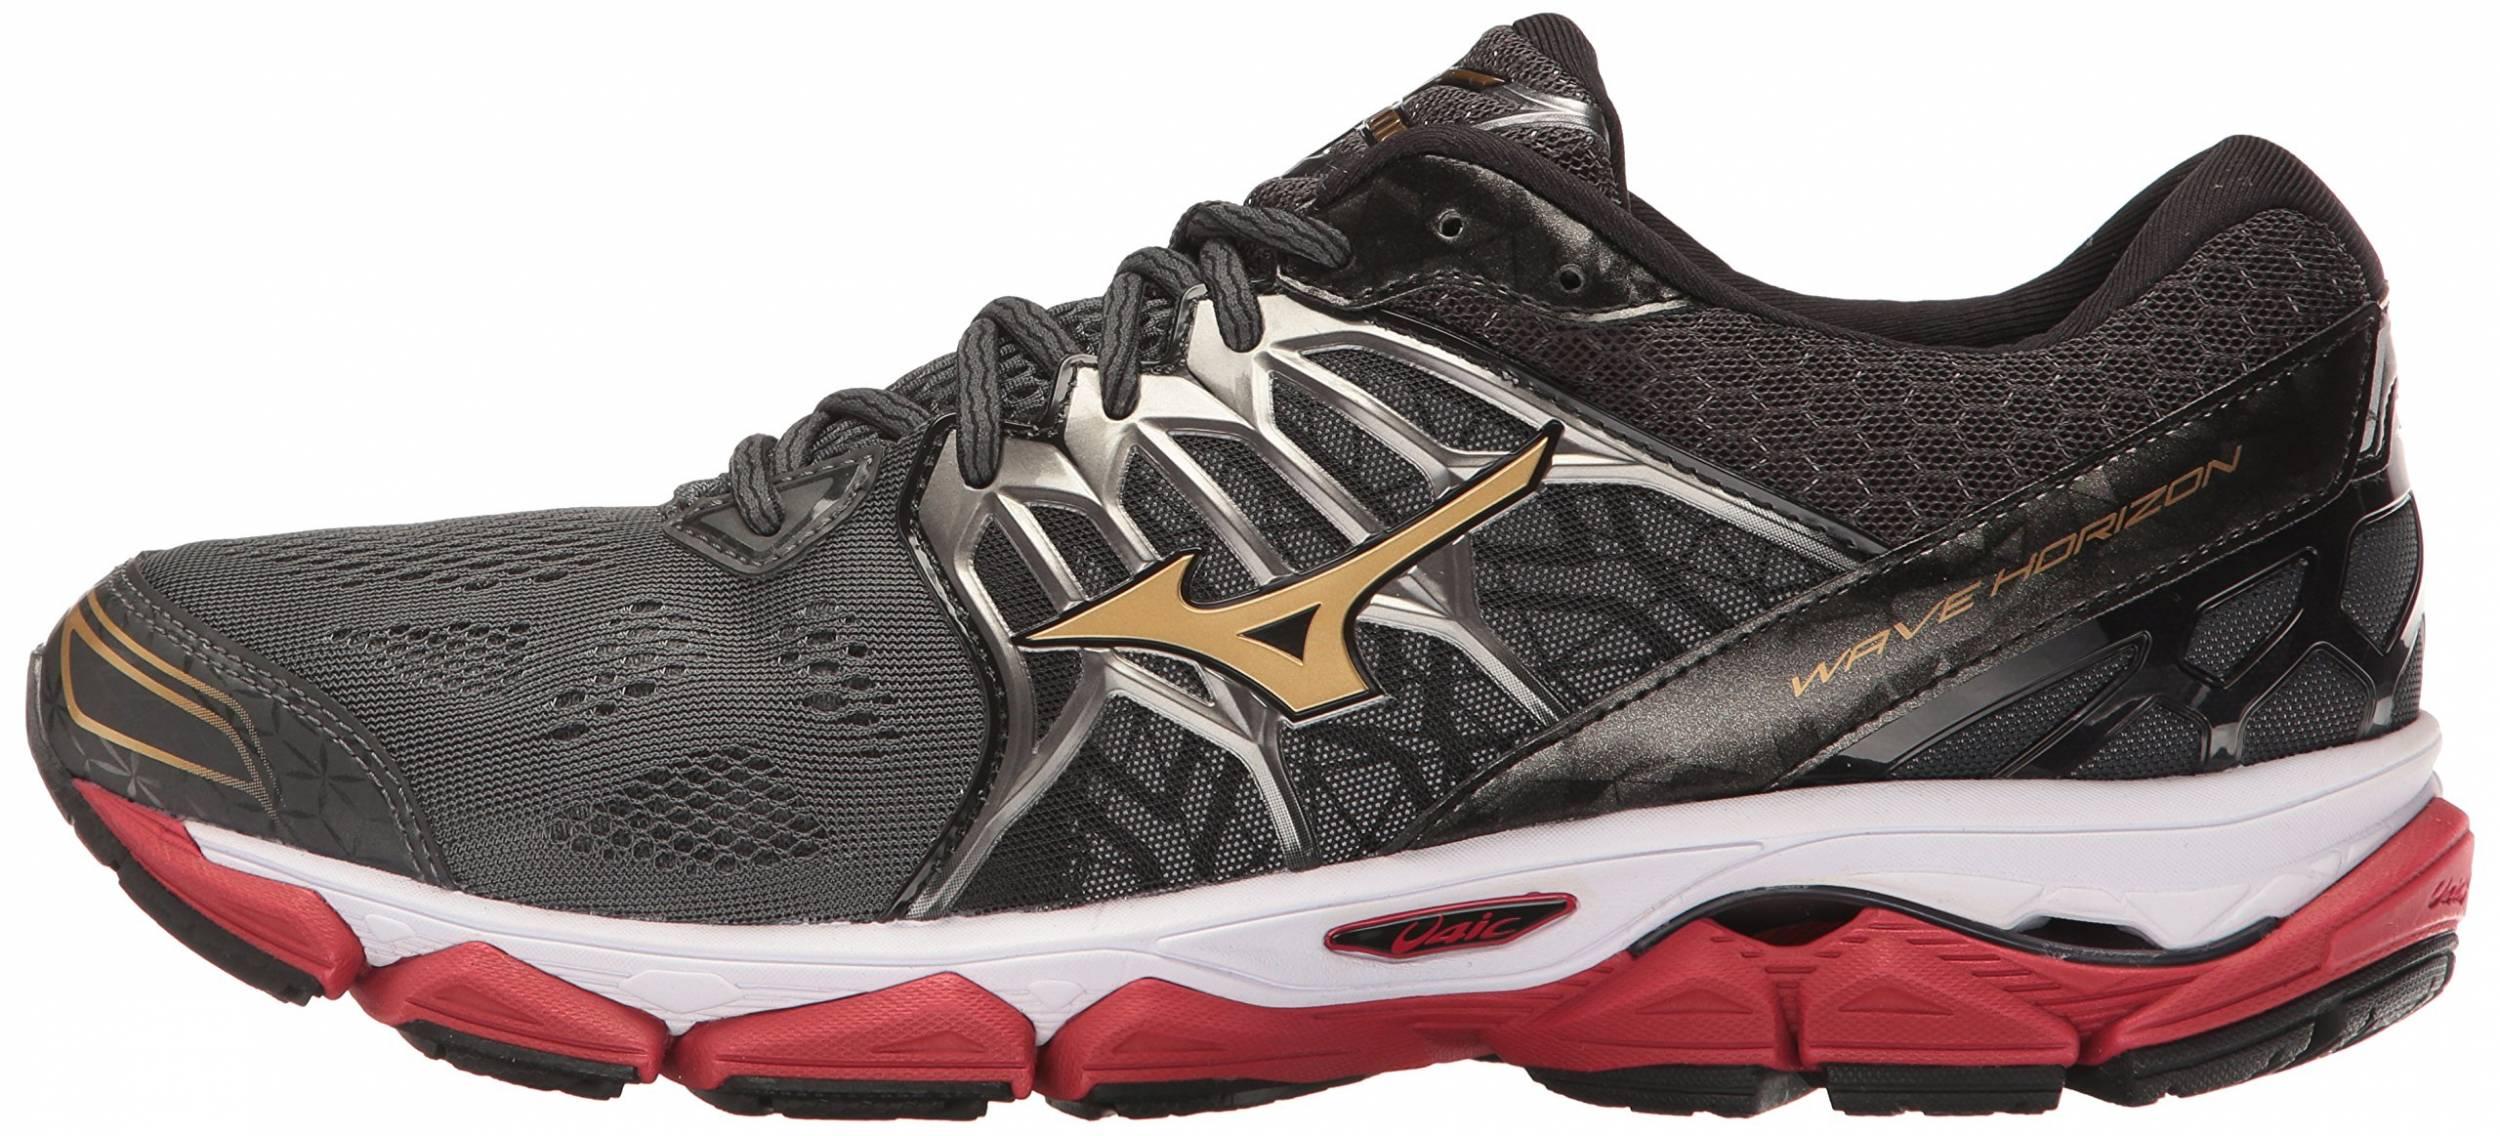 Mizuno Stability Running Shoes